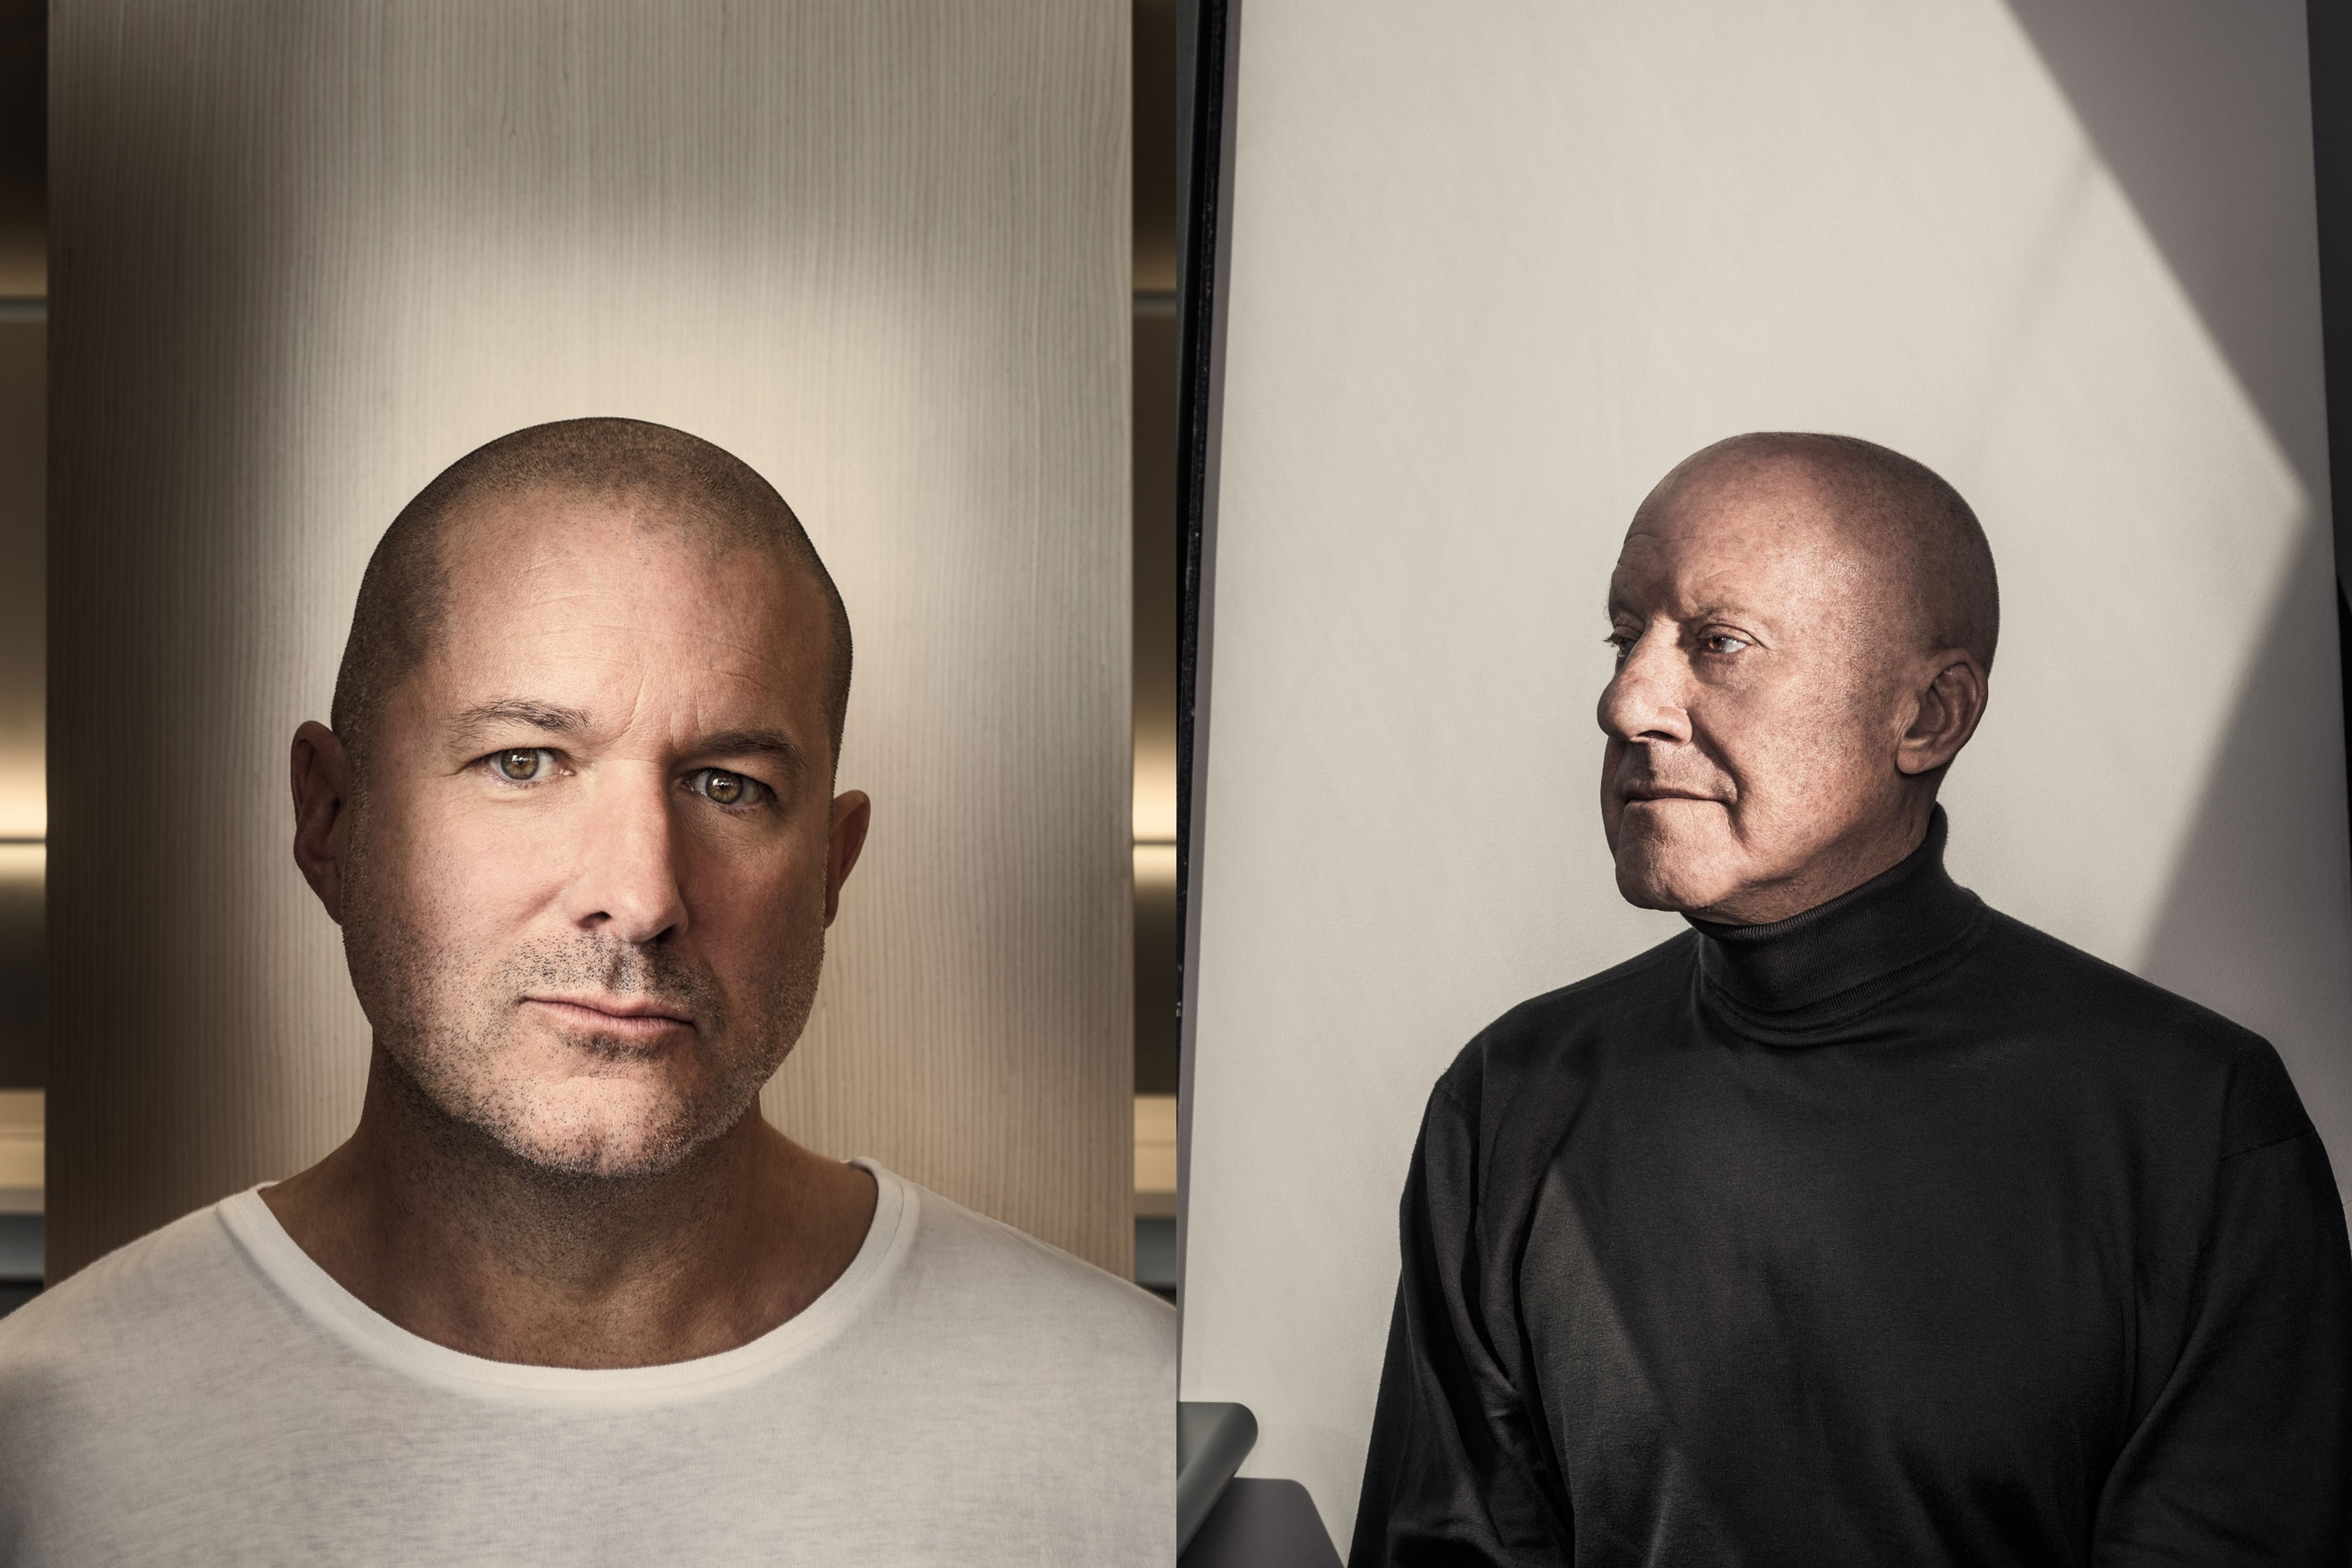 Jony Ive à esquerda; Norman Foster à direita